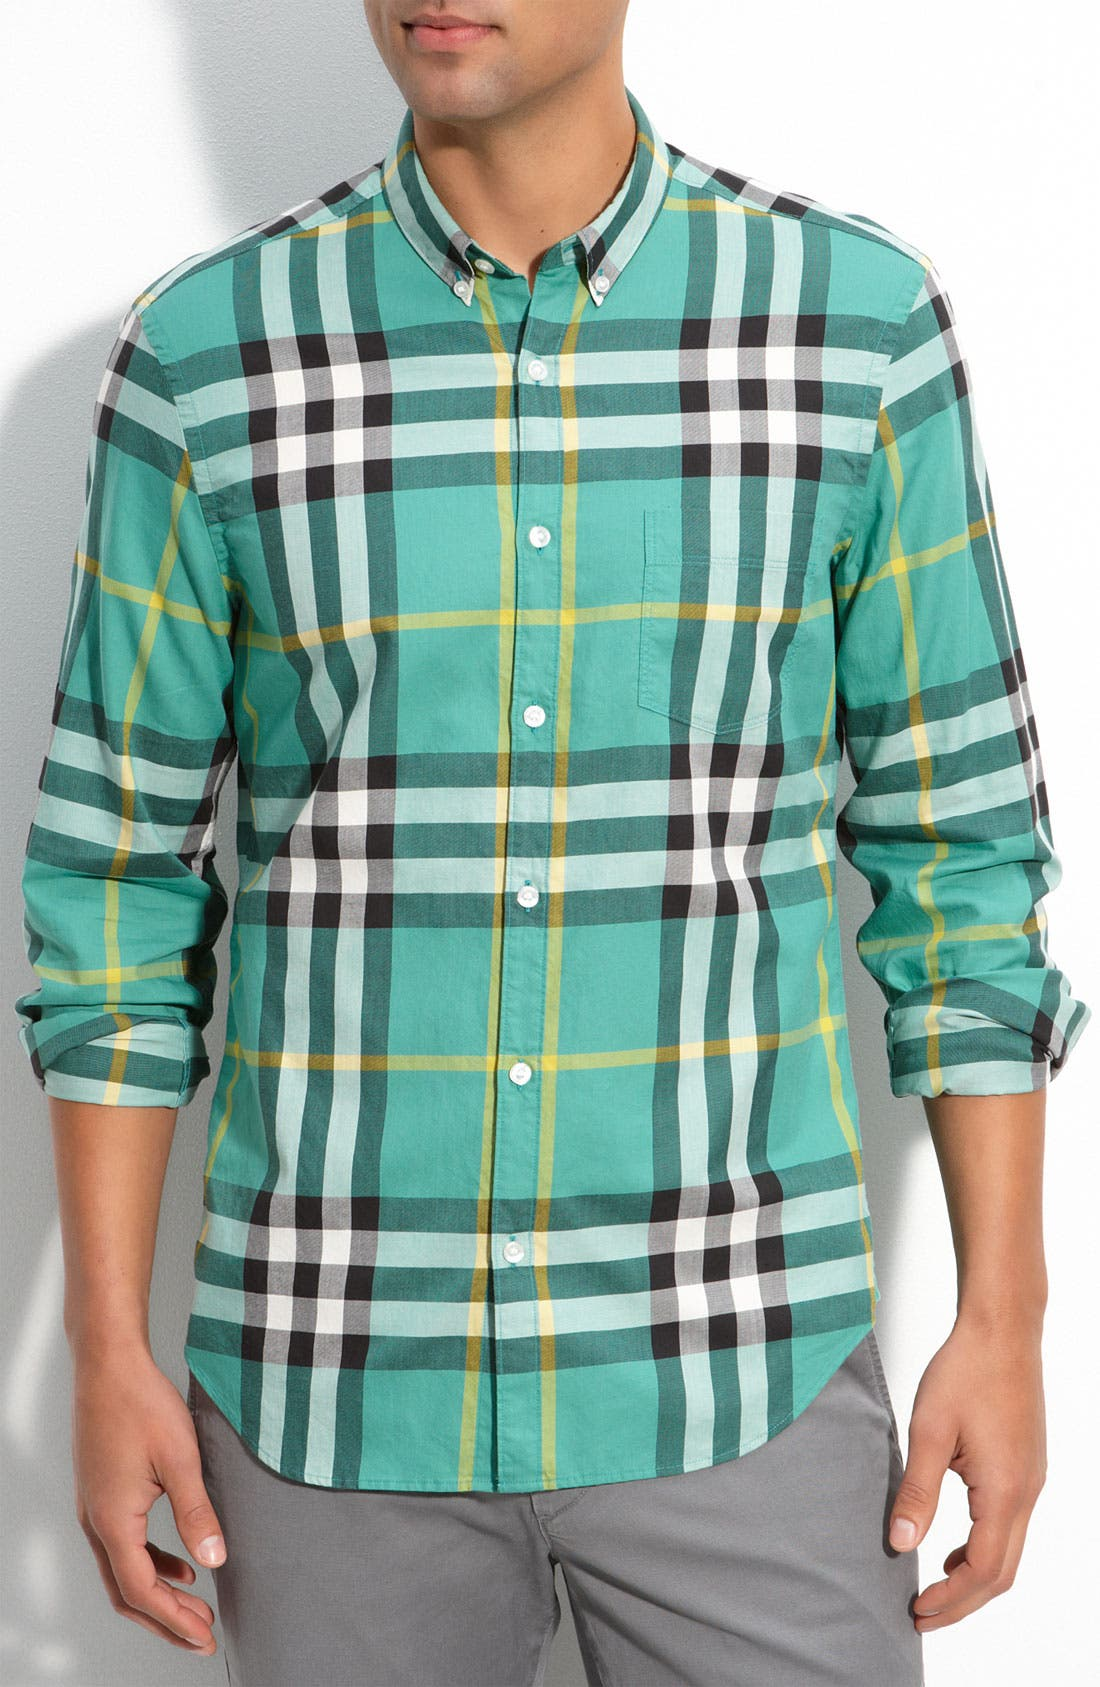 Brit Trim Fit Exploded Check Print Shirt, Main, color, 309